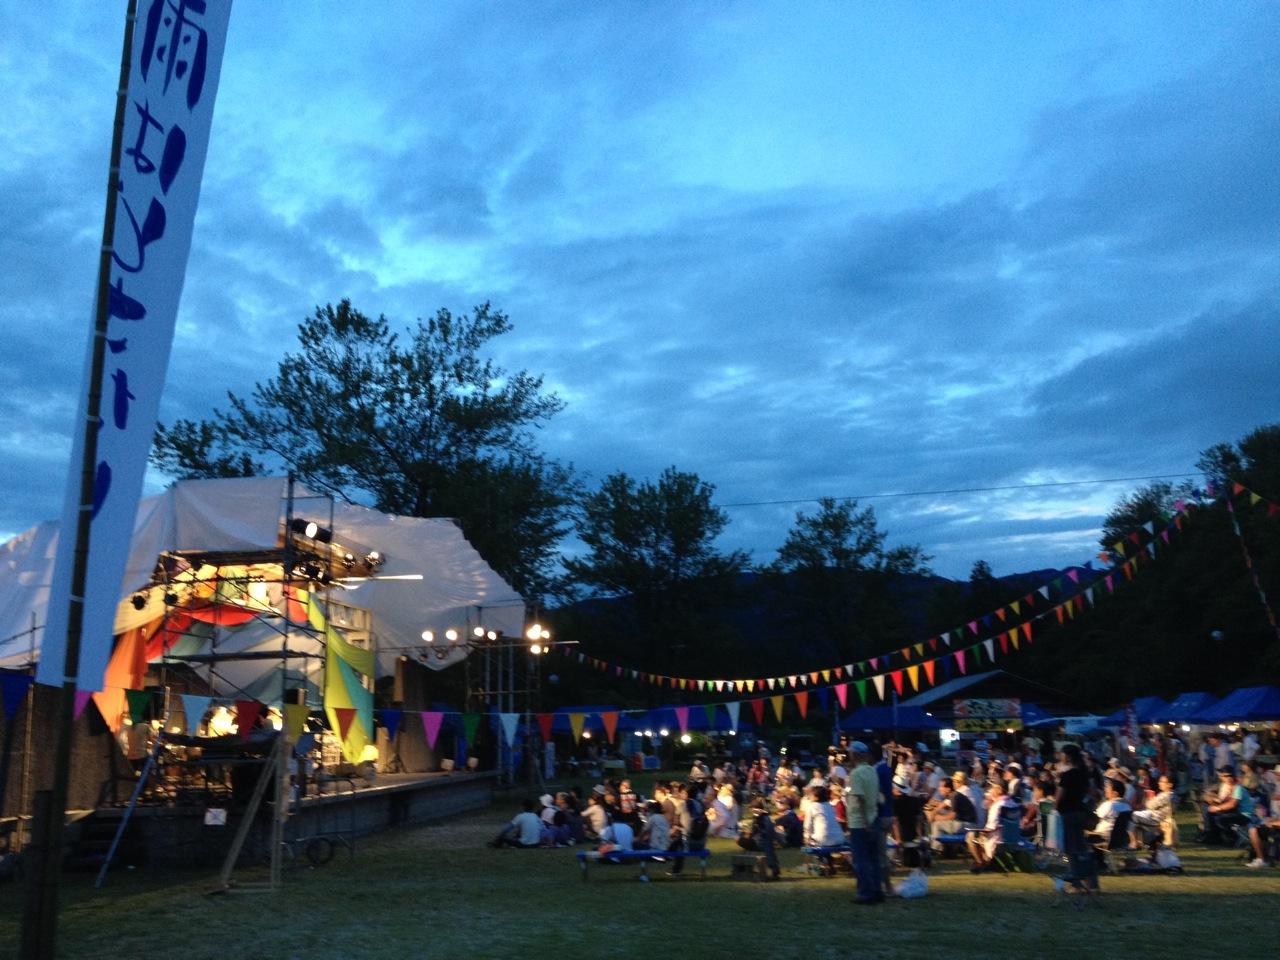 SUNSUN椛の湖コンサート2014、終了致しました!_f0337798_2301160.jpg